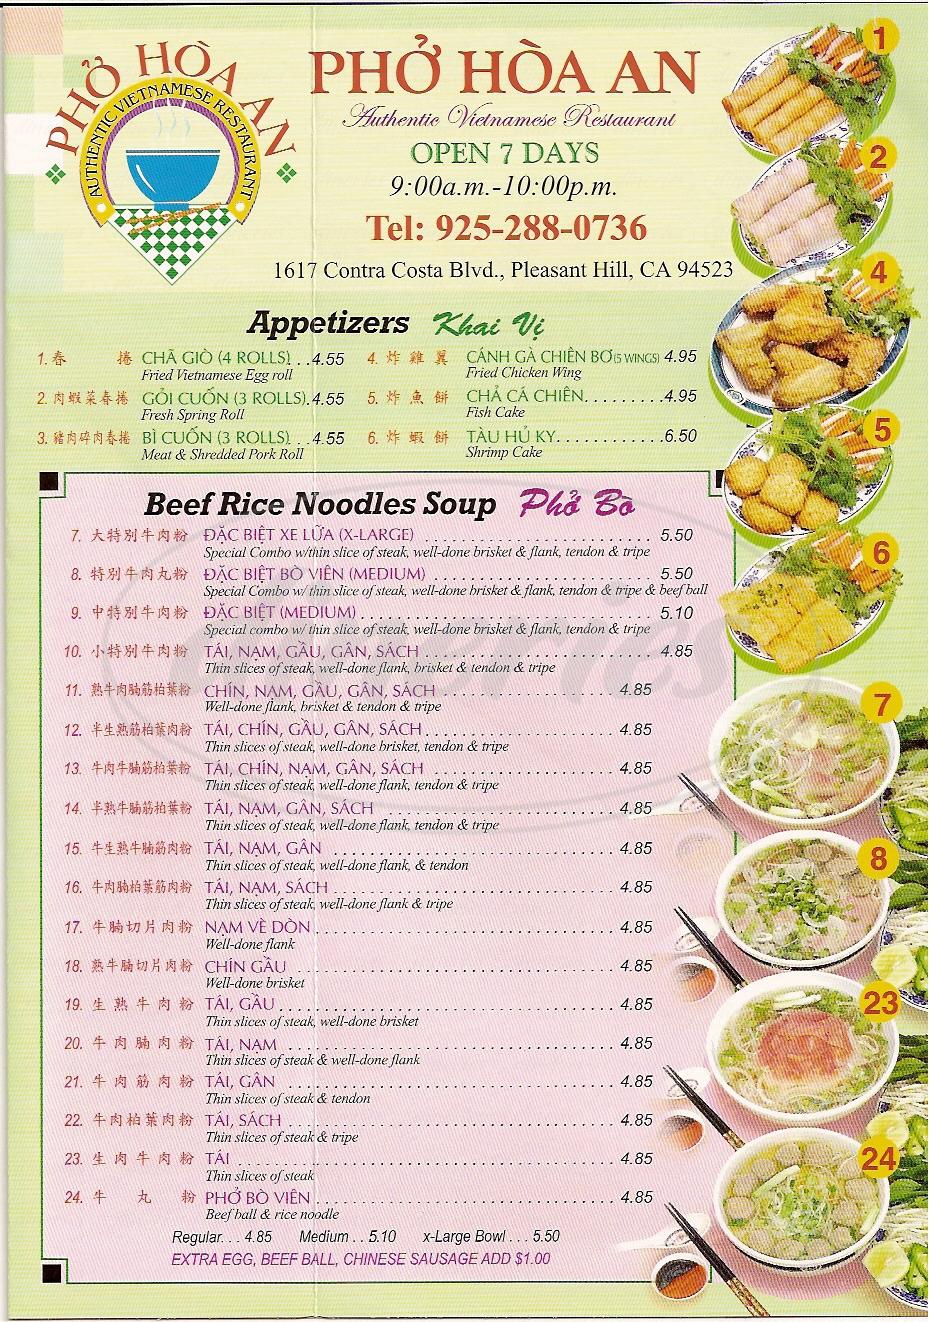 menu for Pho Hoa An